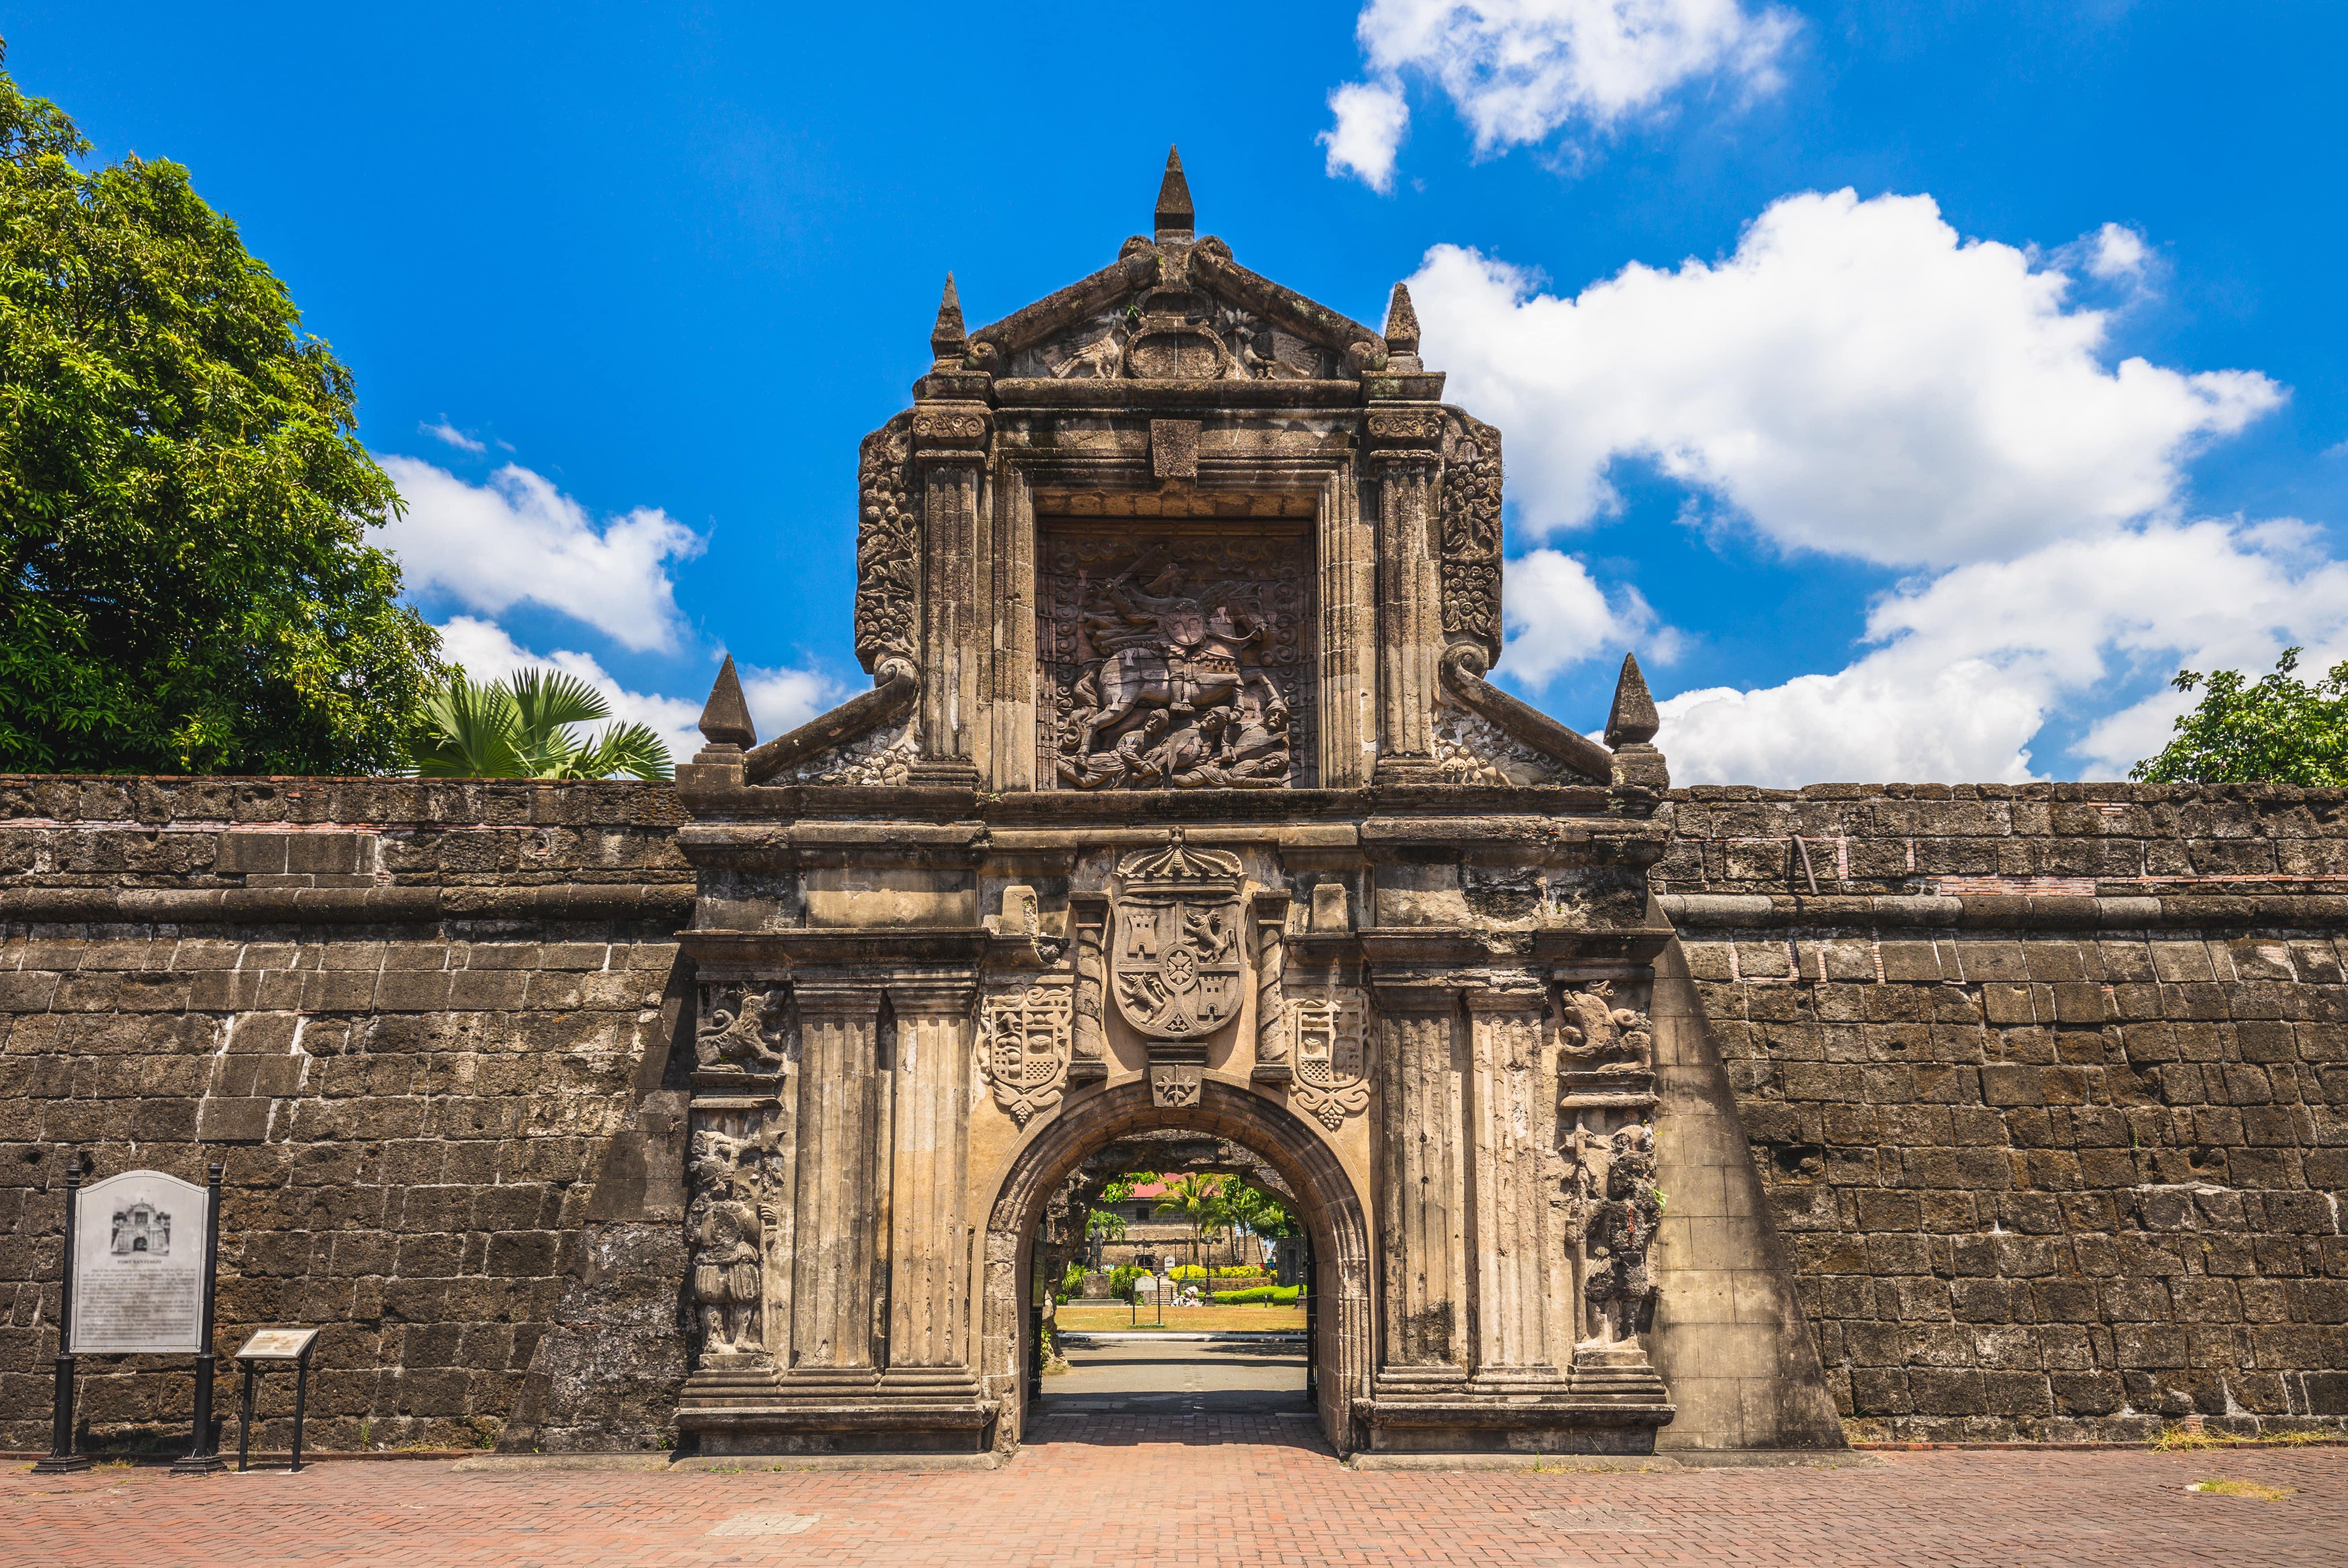 Fort Santiago facade inside Intramuros